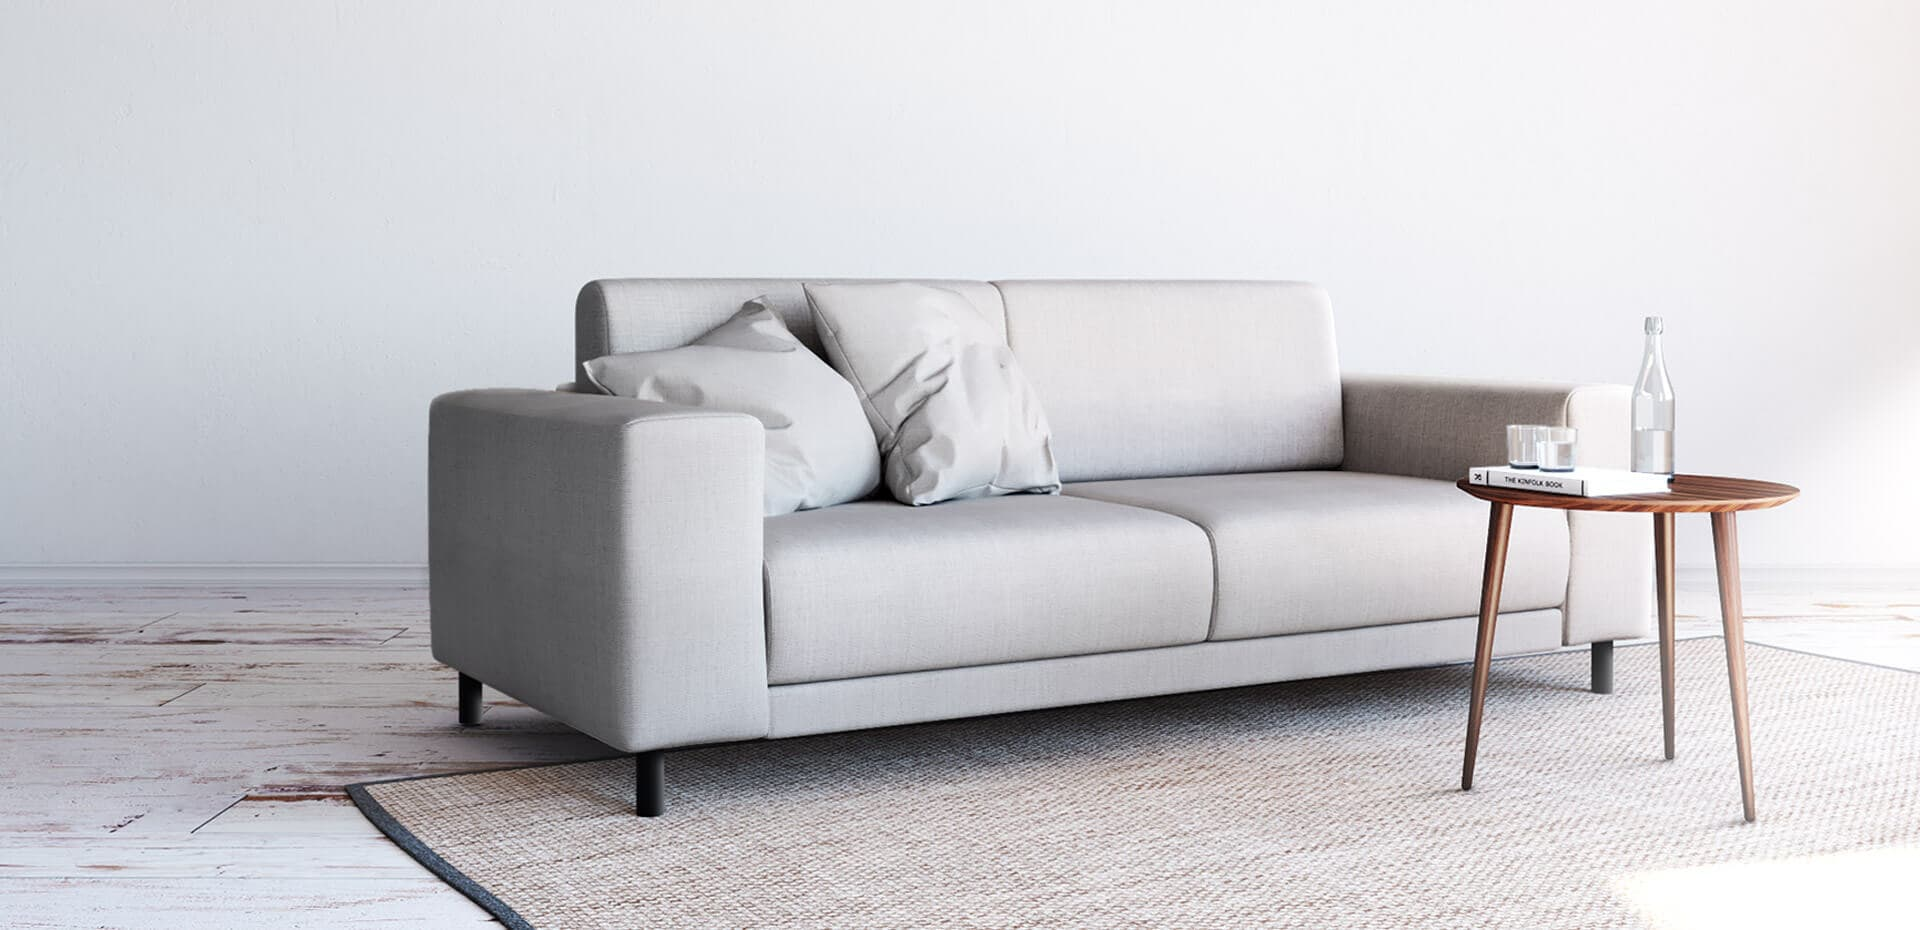 sofa selbst gestalten sofas bei mycs mycs deutschland. Black Bedroom Furniture Sets. Home Design Ideas